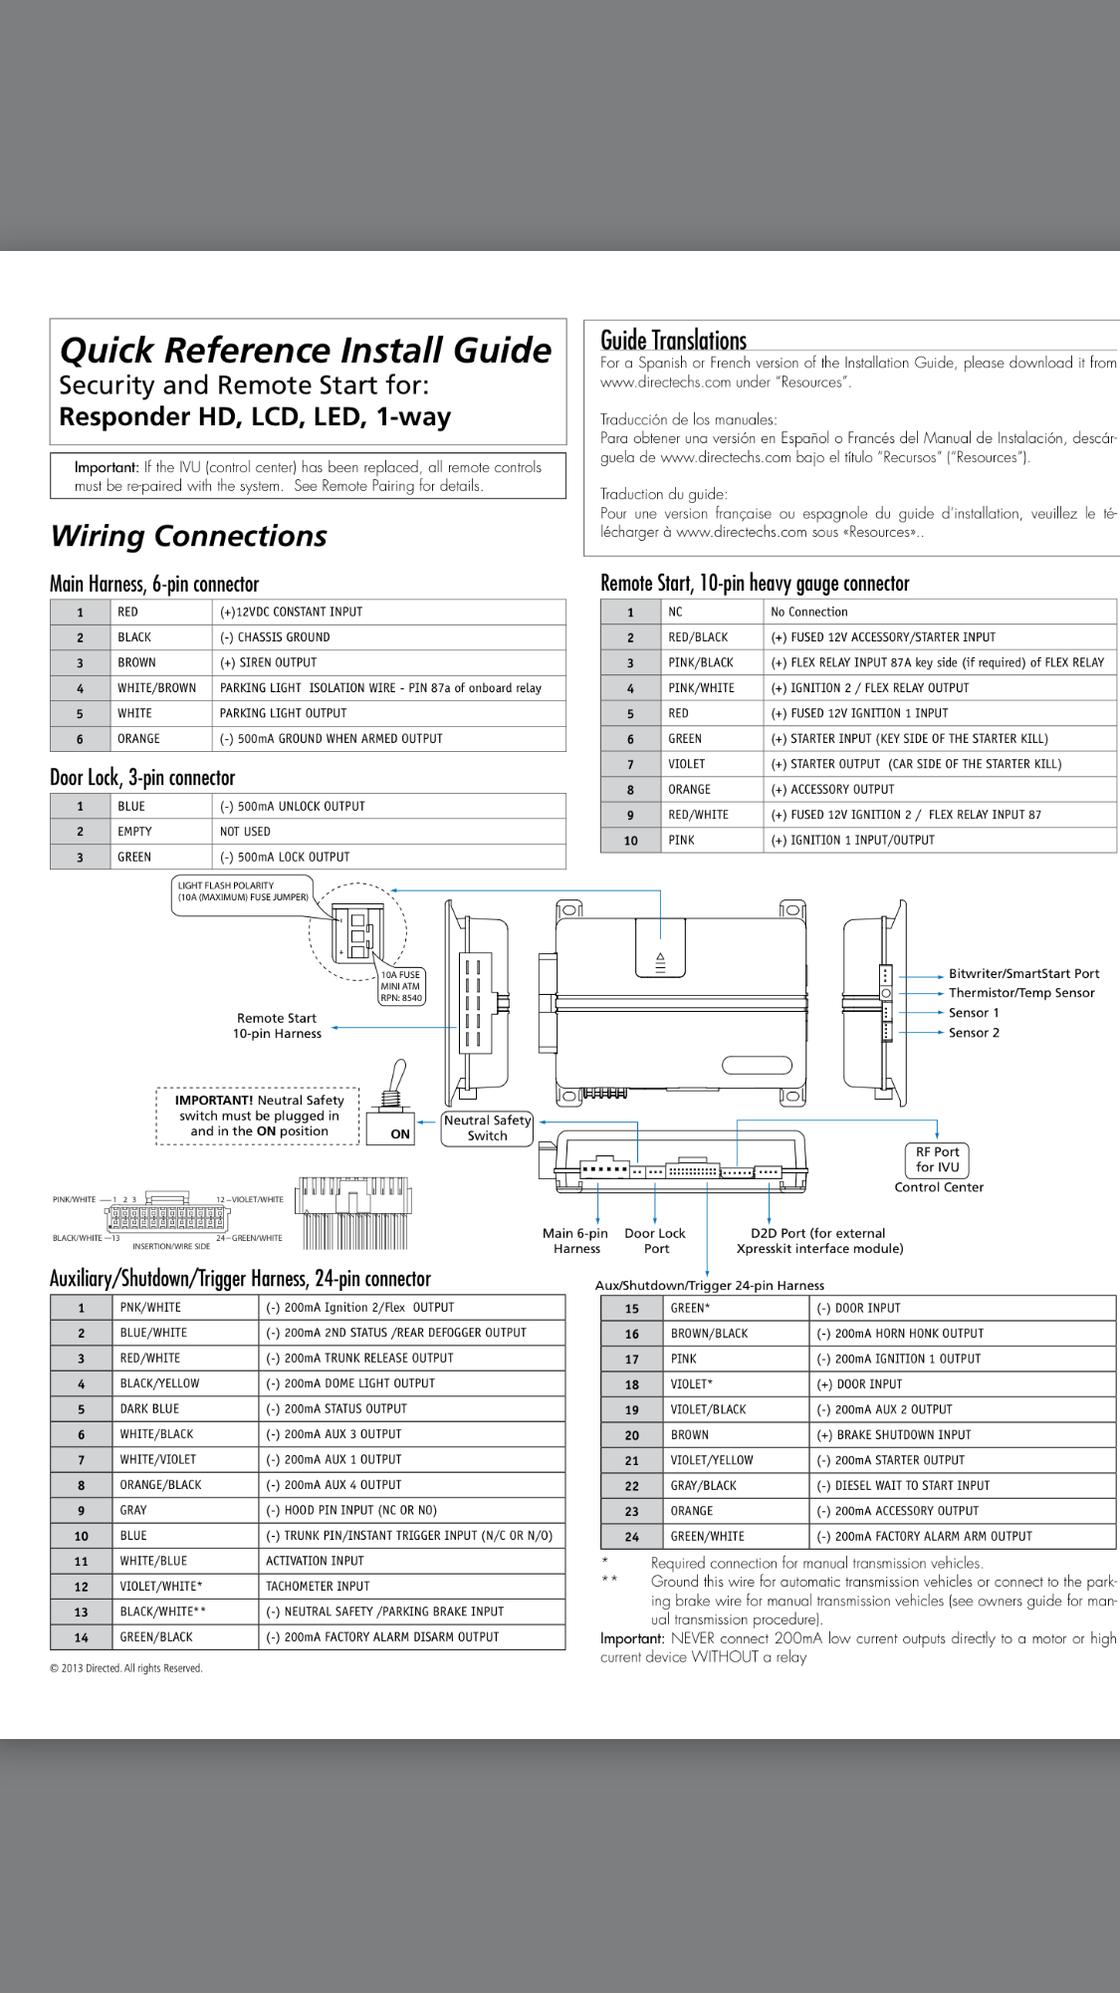 [DVZP_7254]   Wiring Diagram Viper Smartstart - Street Rod Fuse Box Under Hood for Wiring  Diagram Schematics | Viper 5601 Wiring Diagram |  | Wiring Diagram Schematics